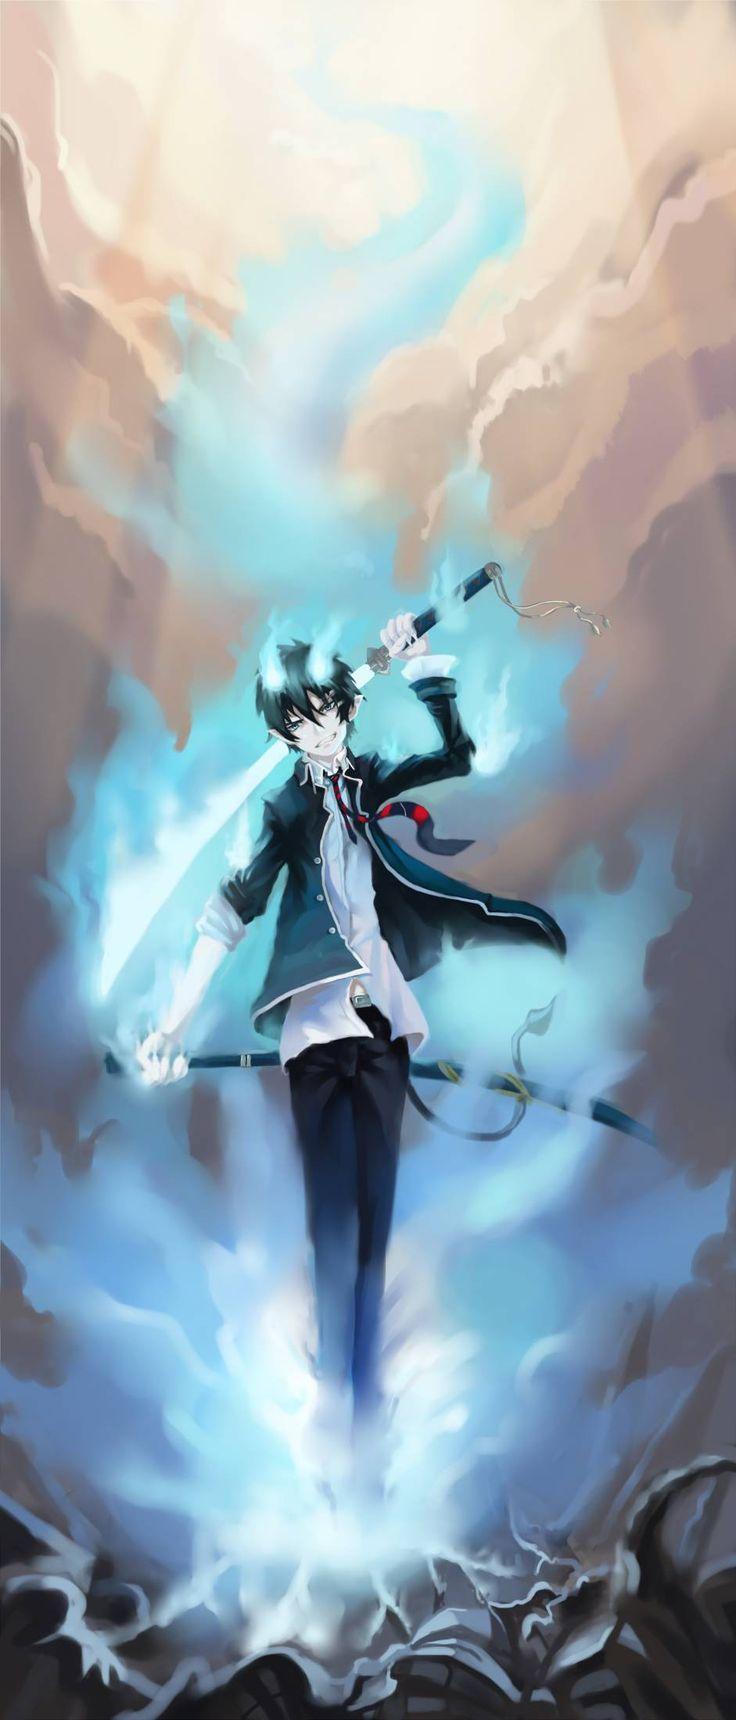 Rin Okumura - Ao no Exorcist / Blue Exorcist